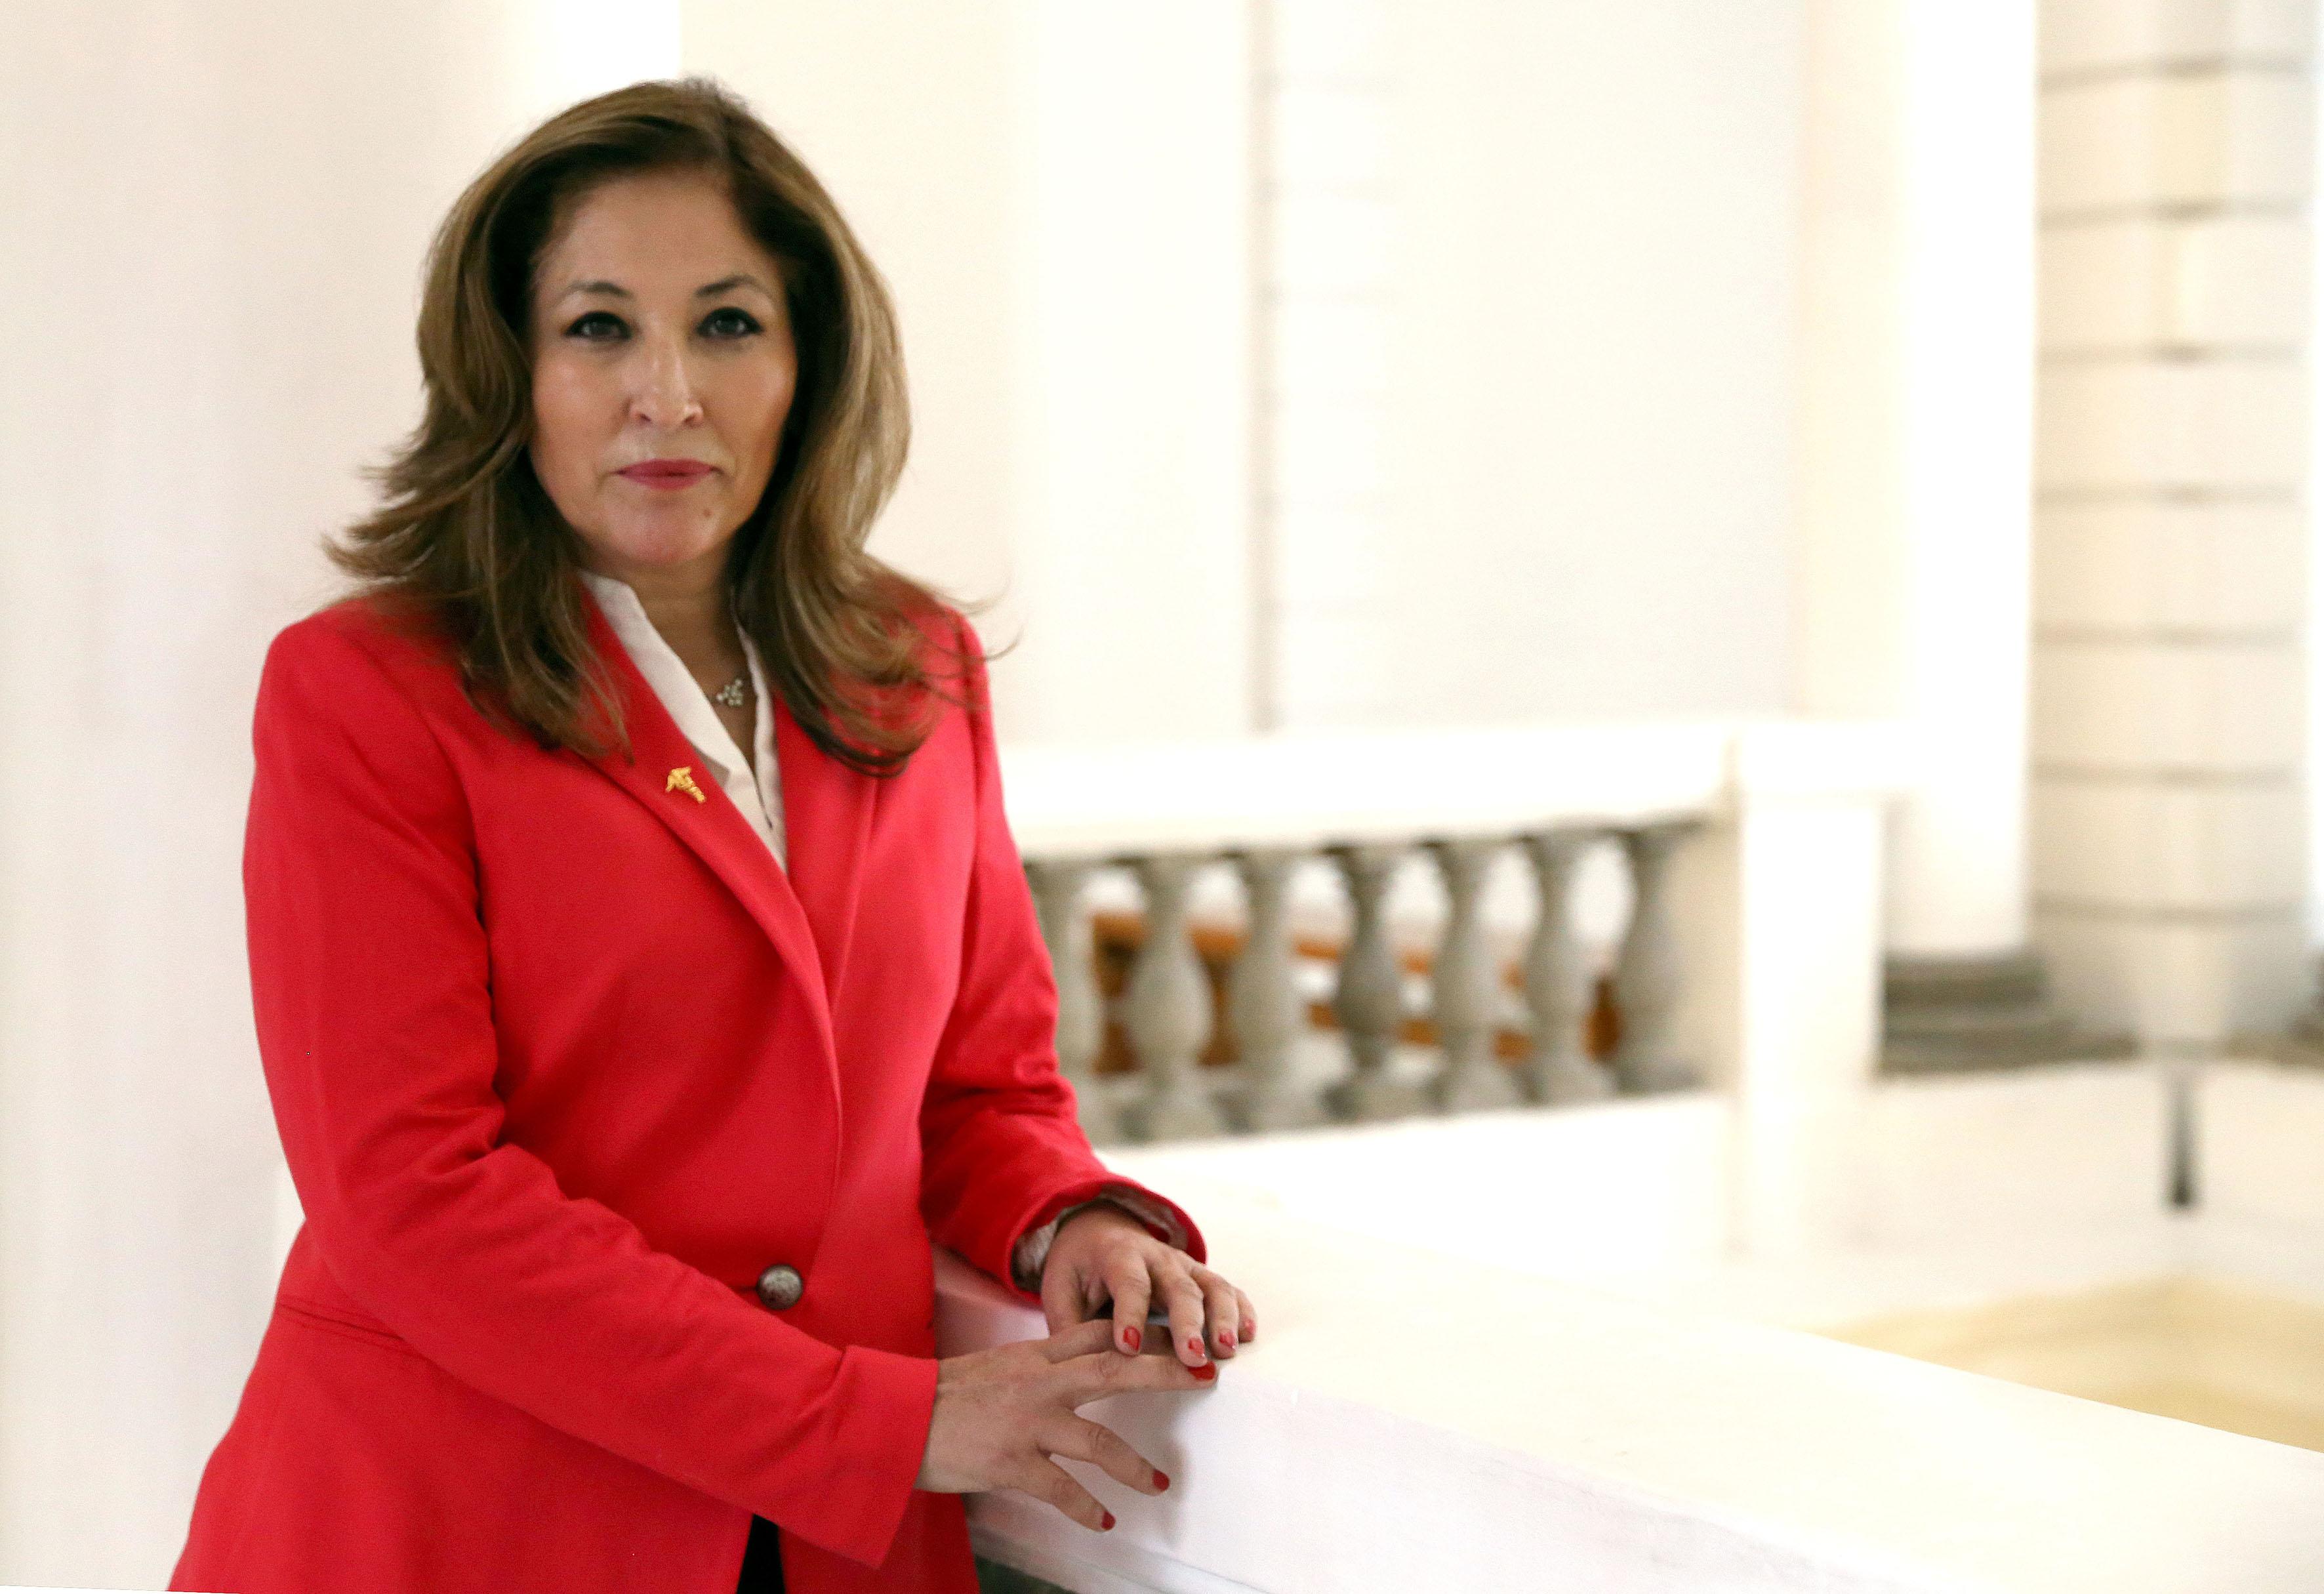 Dra Laura Cortés Sanabria posa para la foto en el barandal de la planta alta del Patio de las Columnas del MUSA